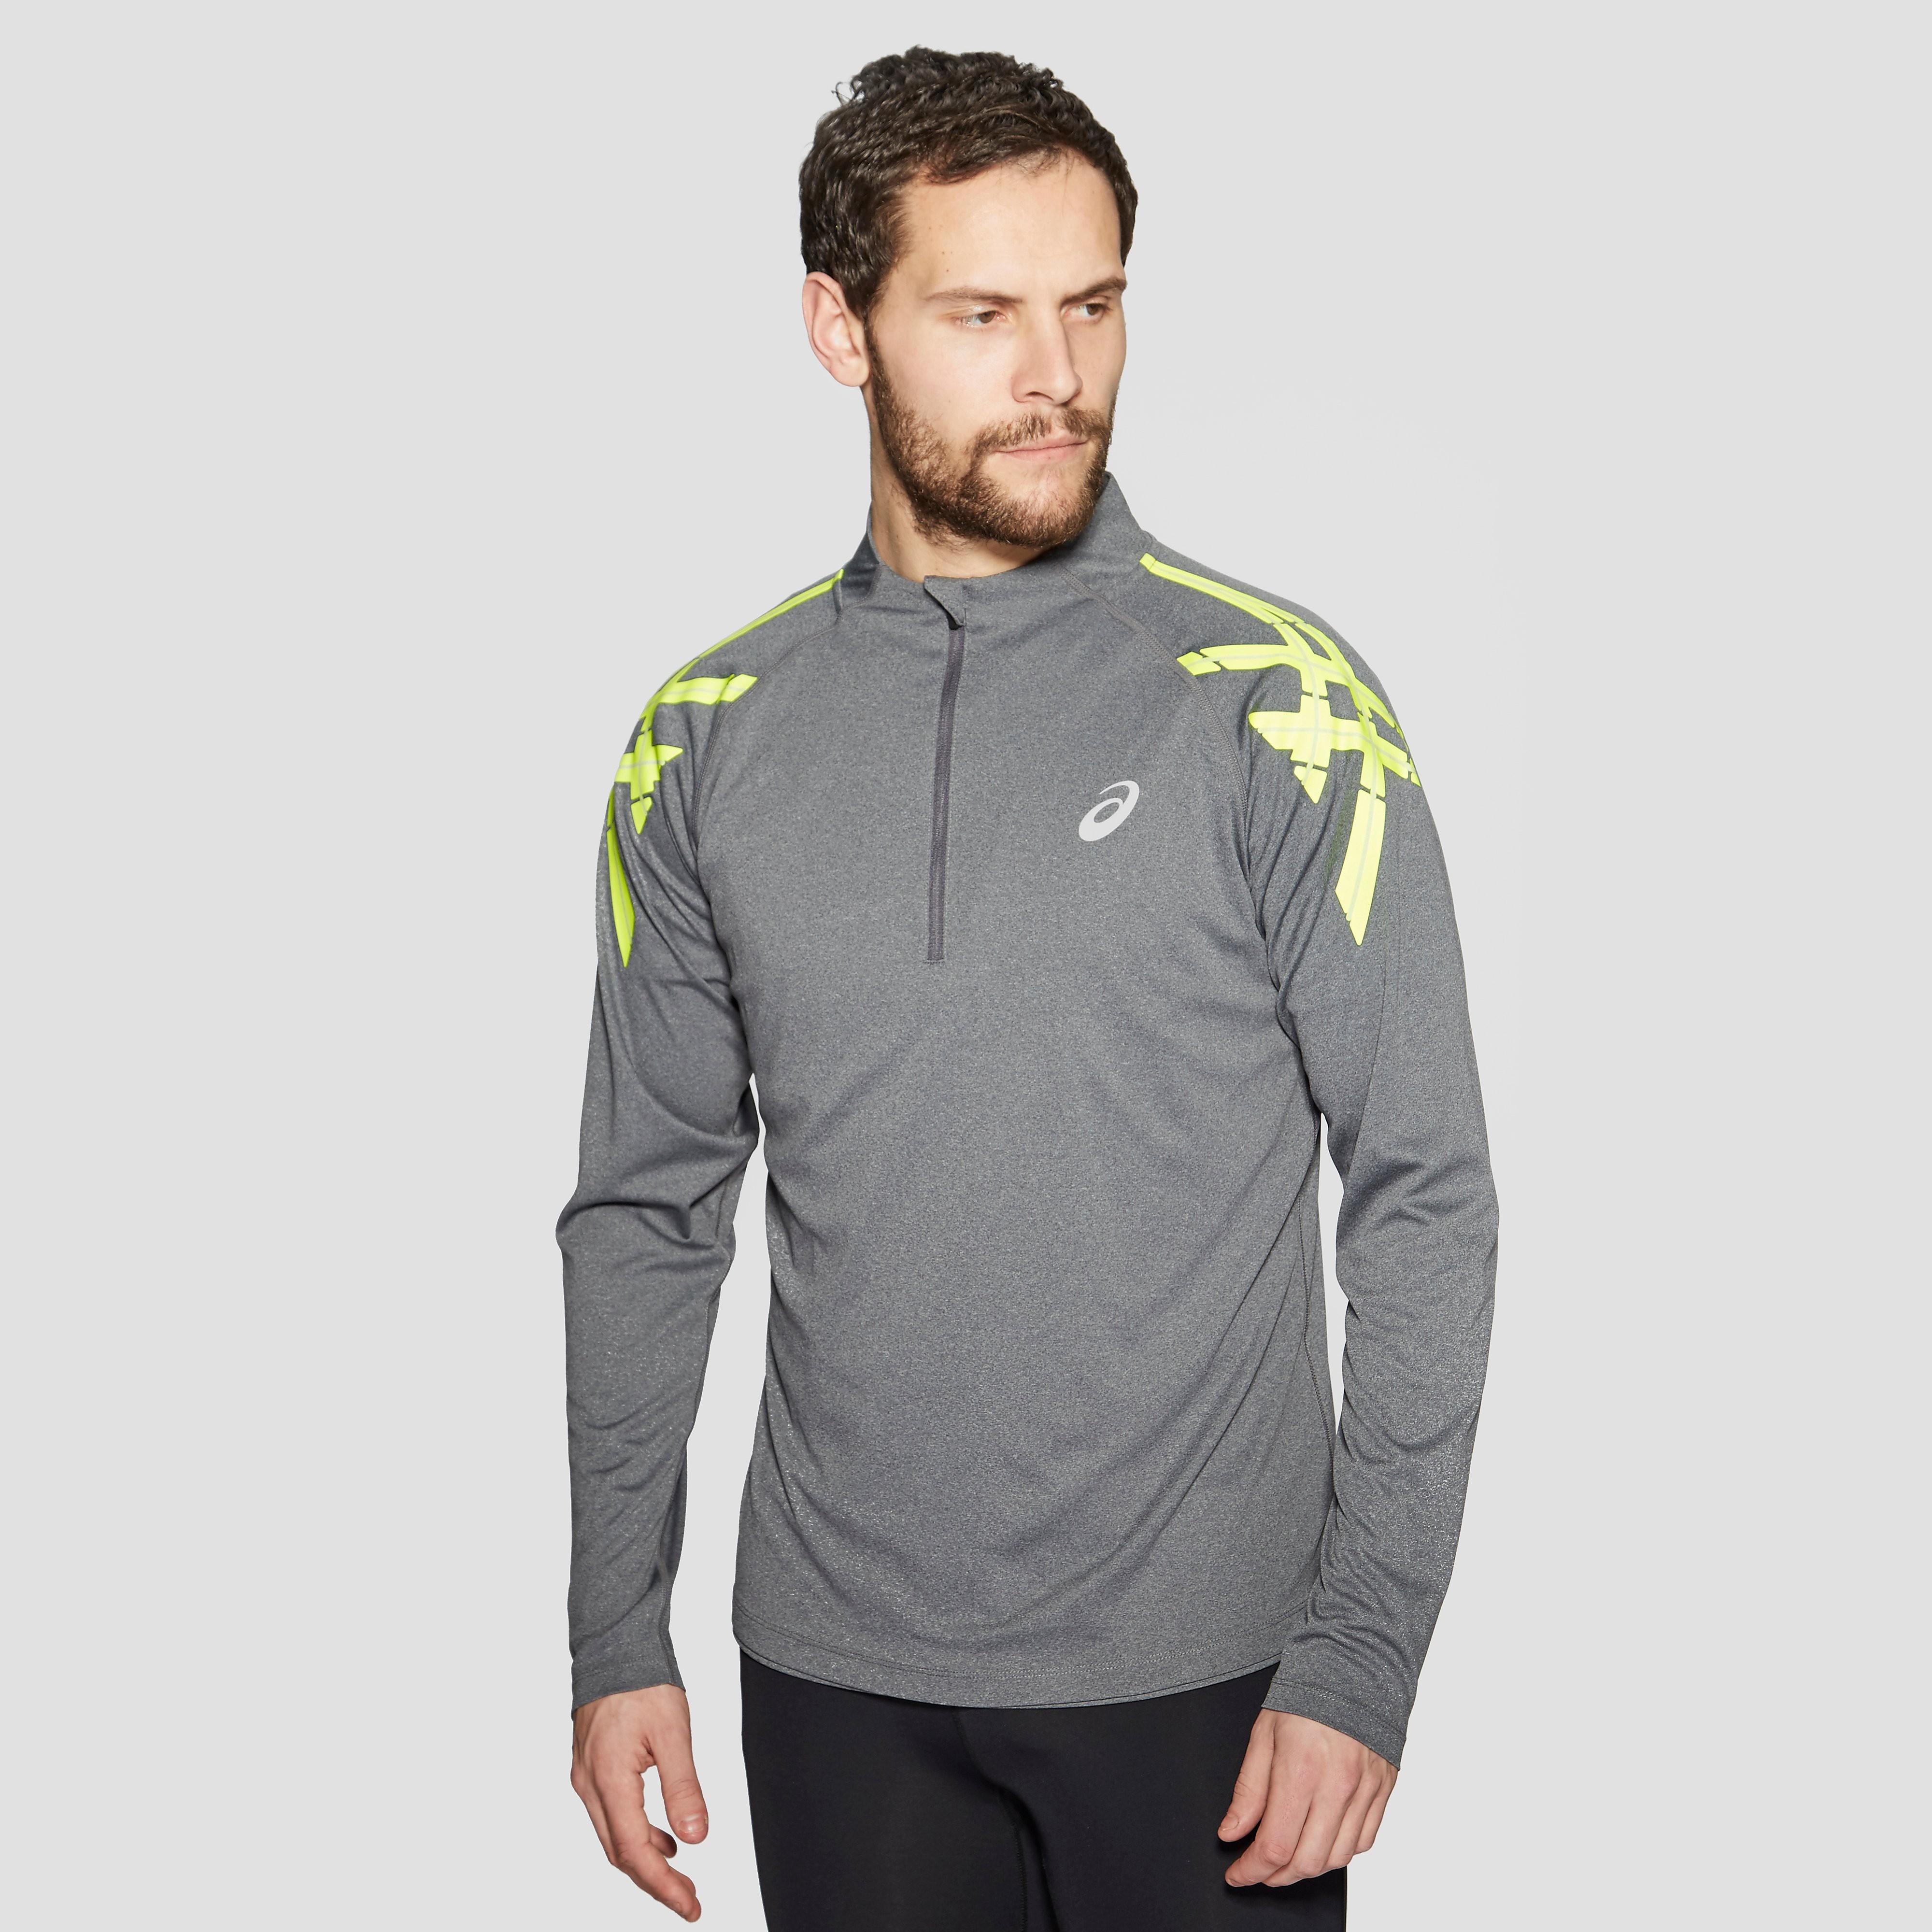 Asics Stripe 1/2 Zip Long Sleeve Men's Training Top